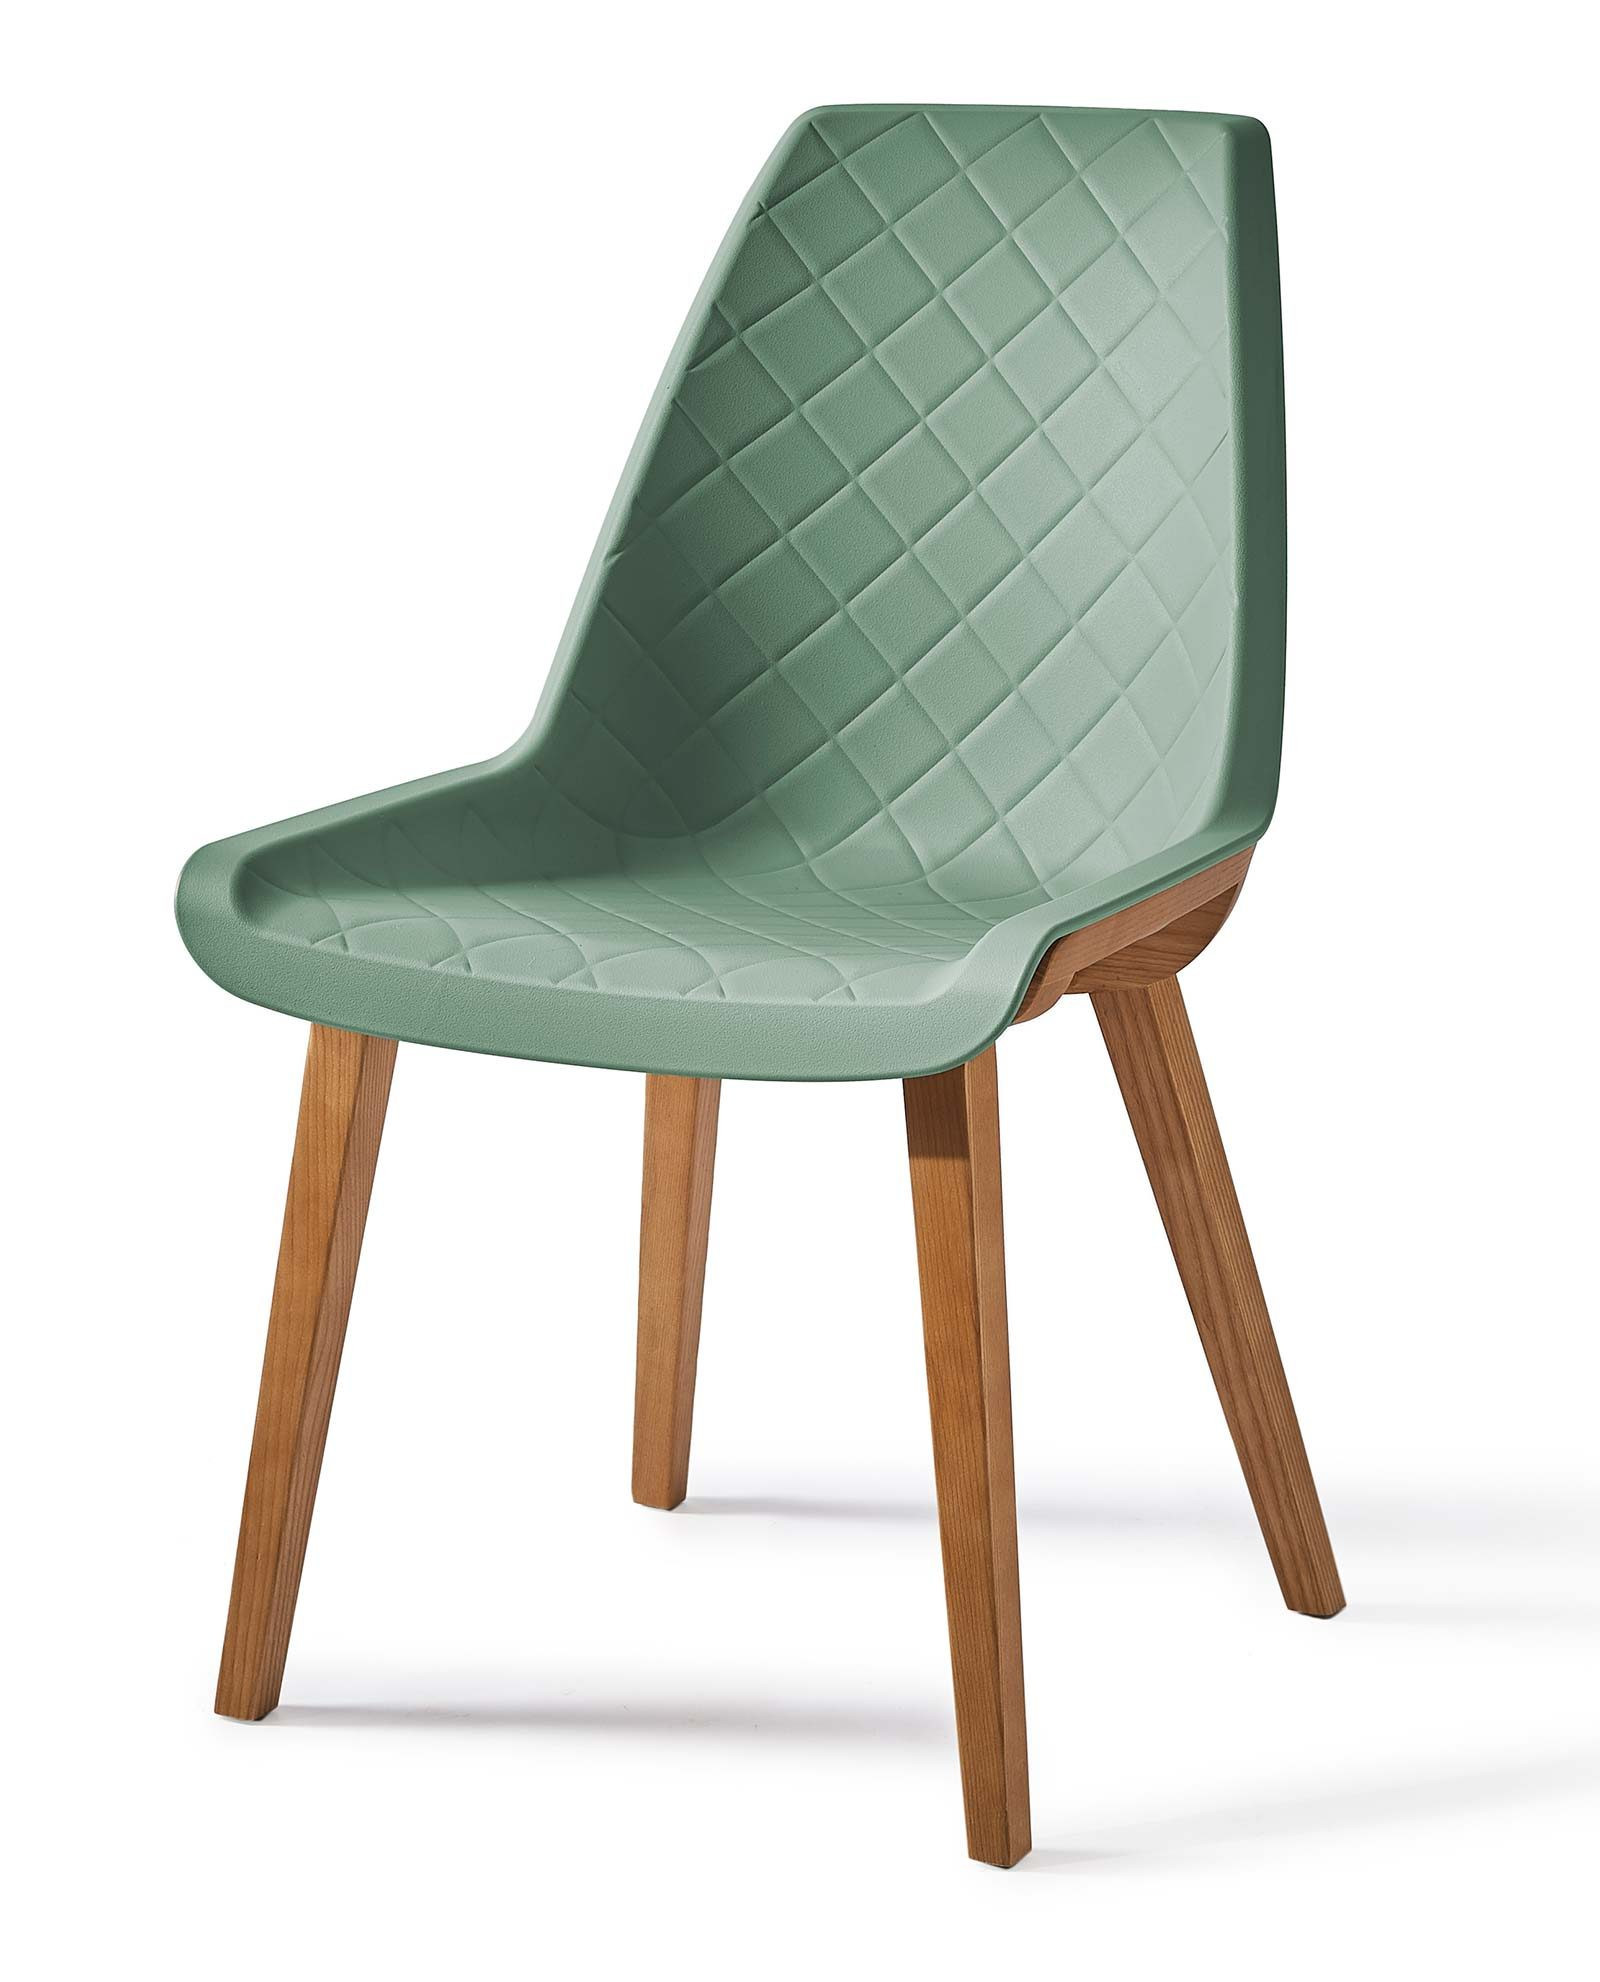 Riviera Maison chaise salle a manger Amsterdam City Green 4321003 1